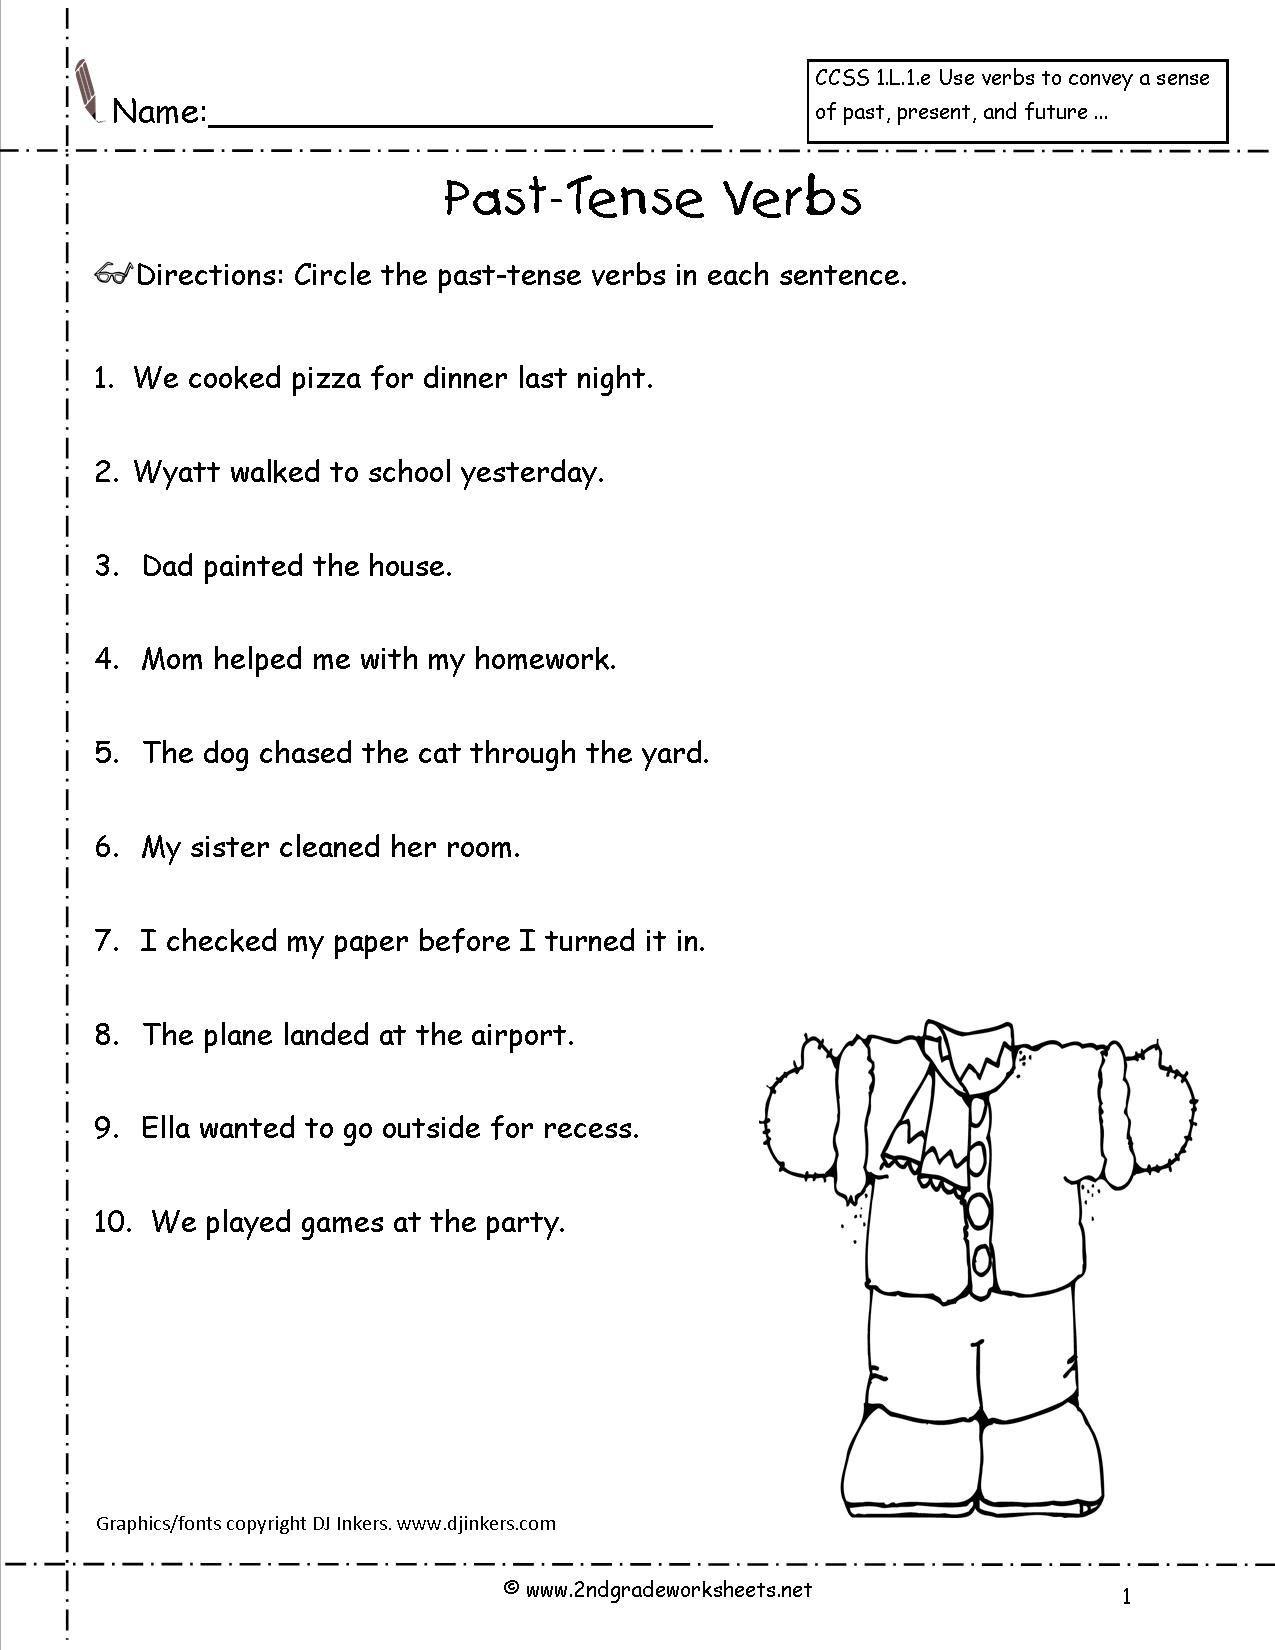 Verb Tense Worksheets 2nd Grade Present Tense Worksheet Grade 2